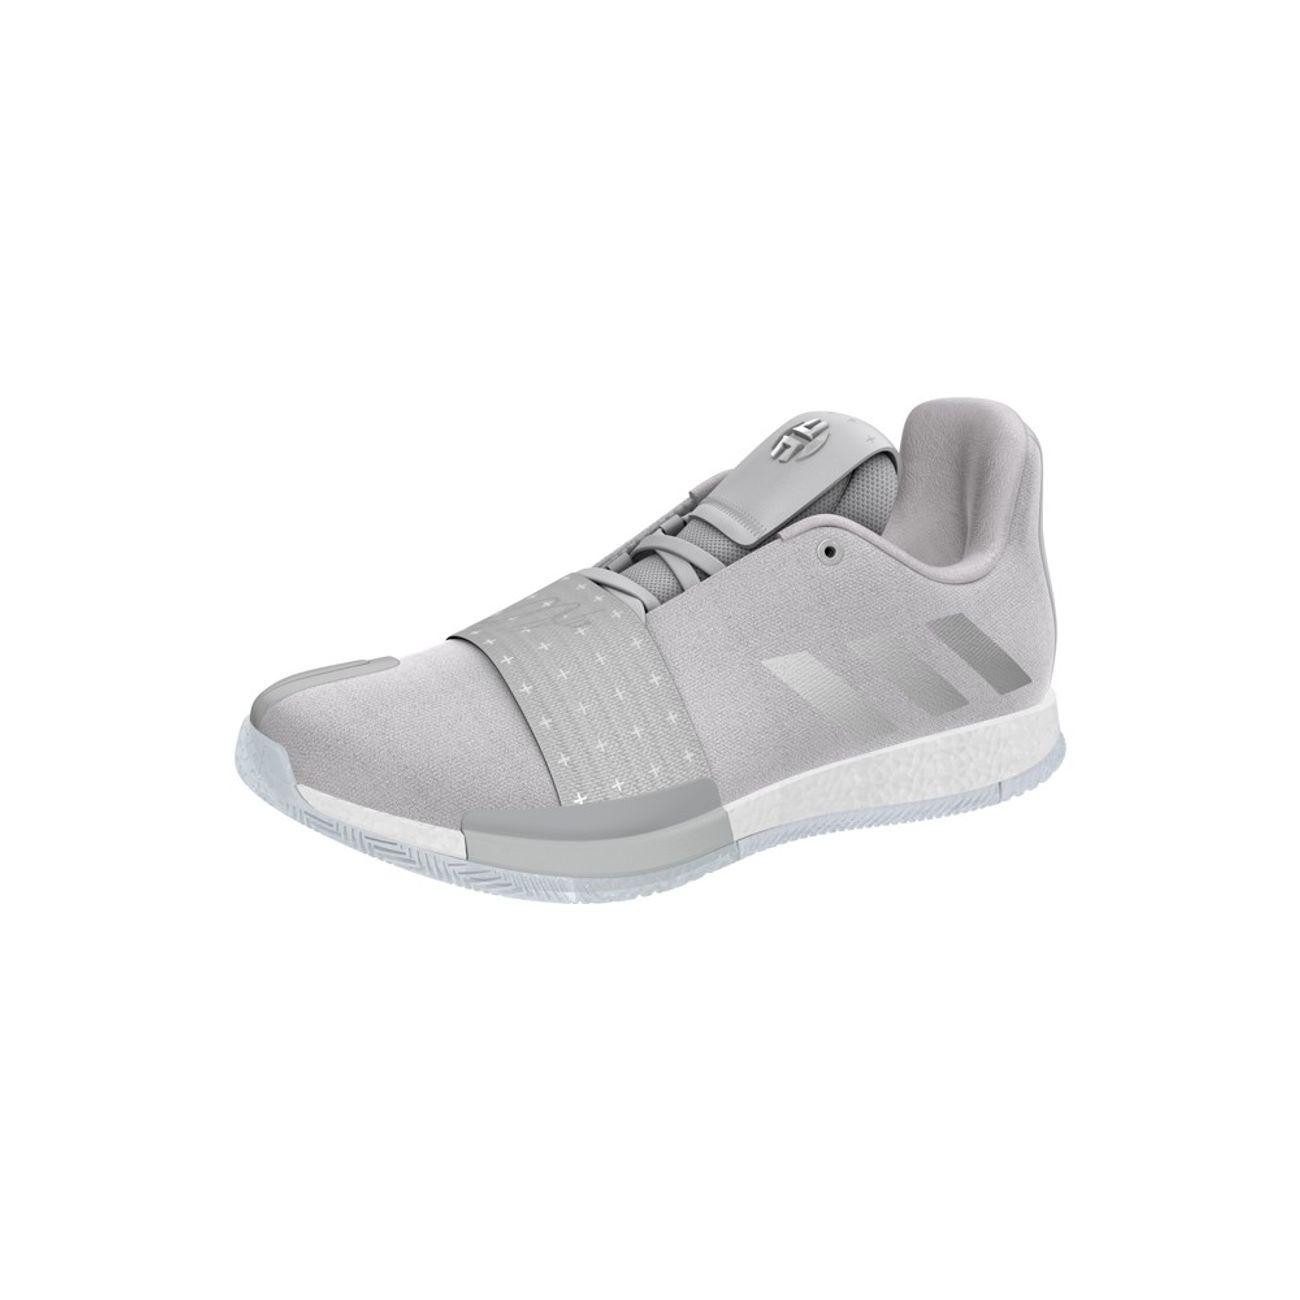 Basket ball adulte ADIDAS Chaussure de Basketball adidas James Harden Vol.3 Voyager Gris pour homme Pointure - 44